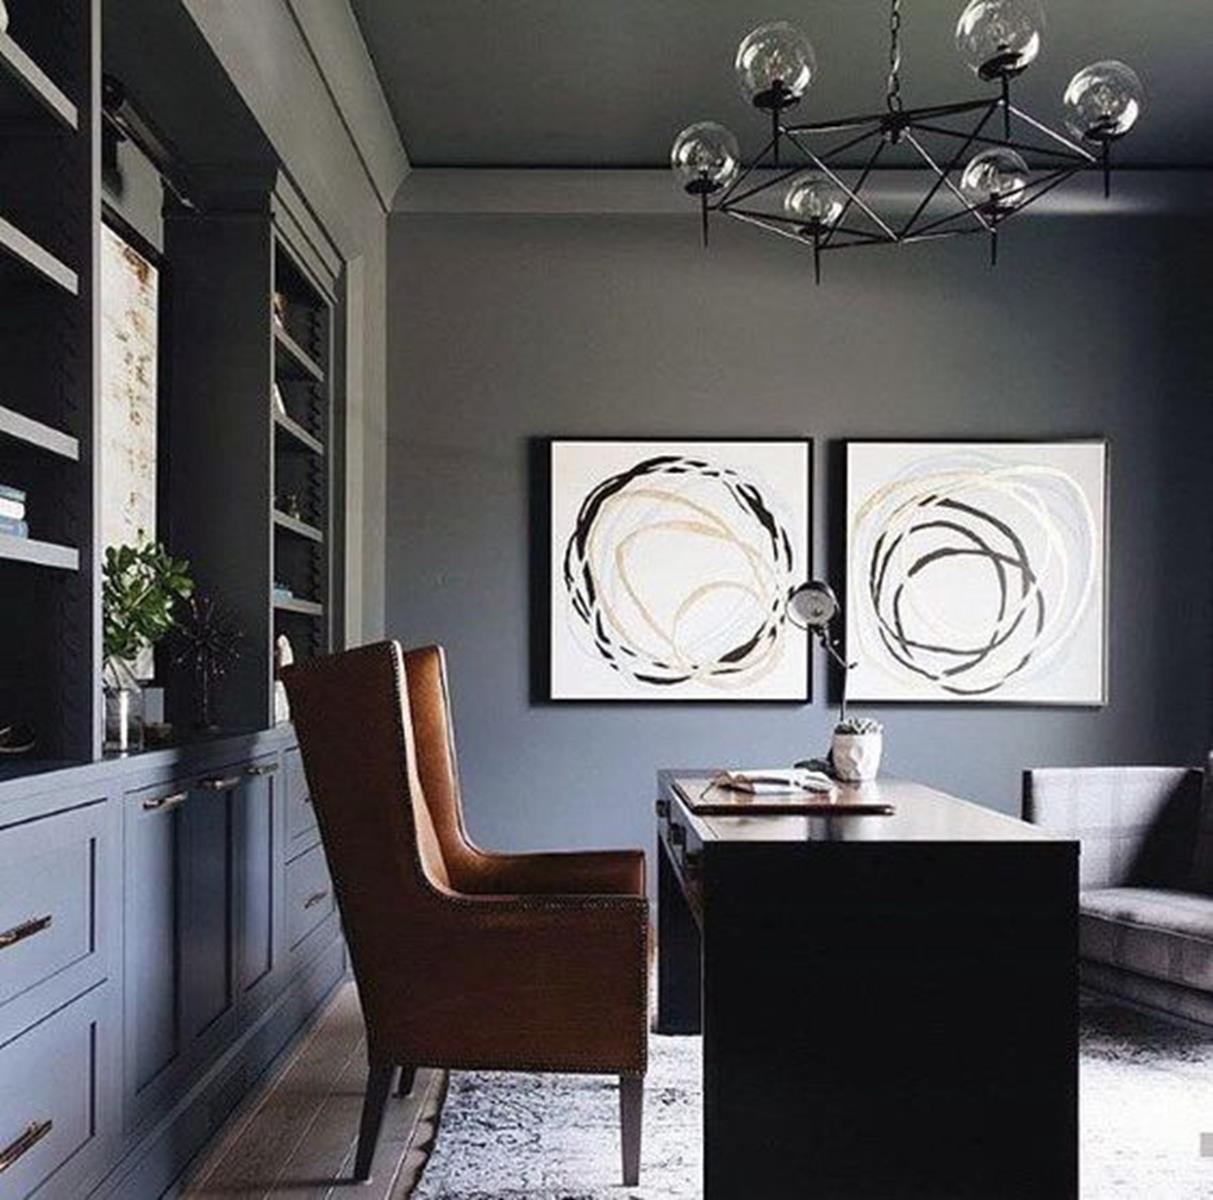 mörkt-modernt-kontor-hemmakontor-inspirerande